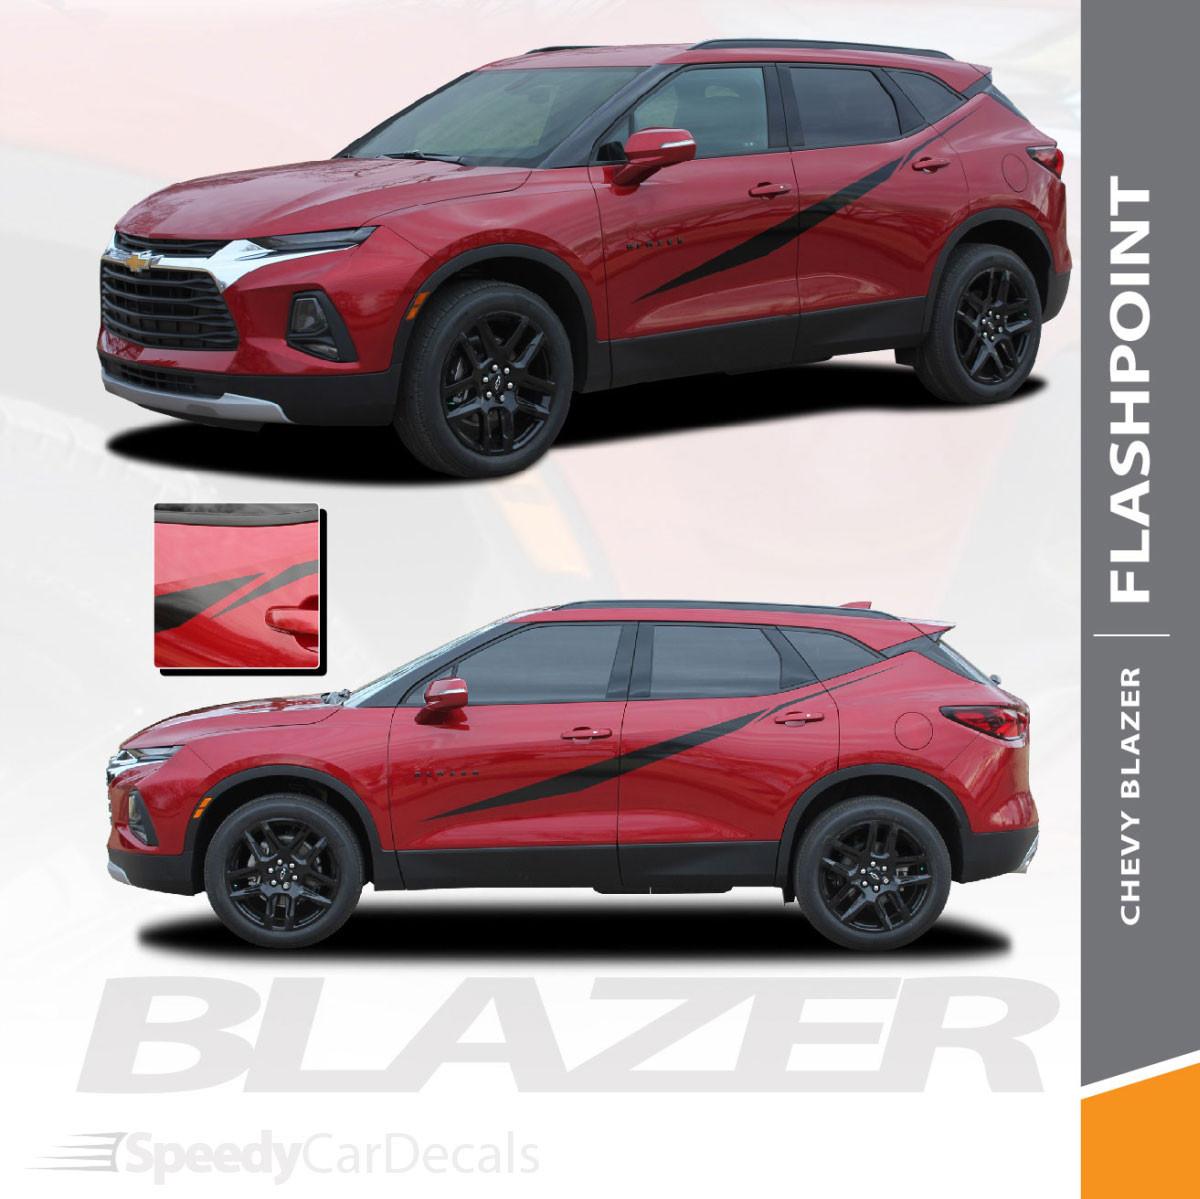 2019-2020 Chevy Blazer FLASHPOINT SIDE KIT Stripes